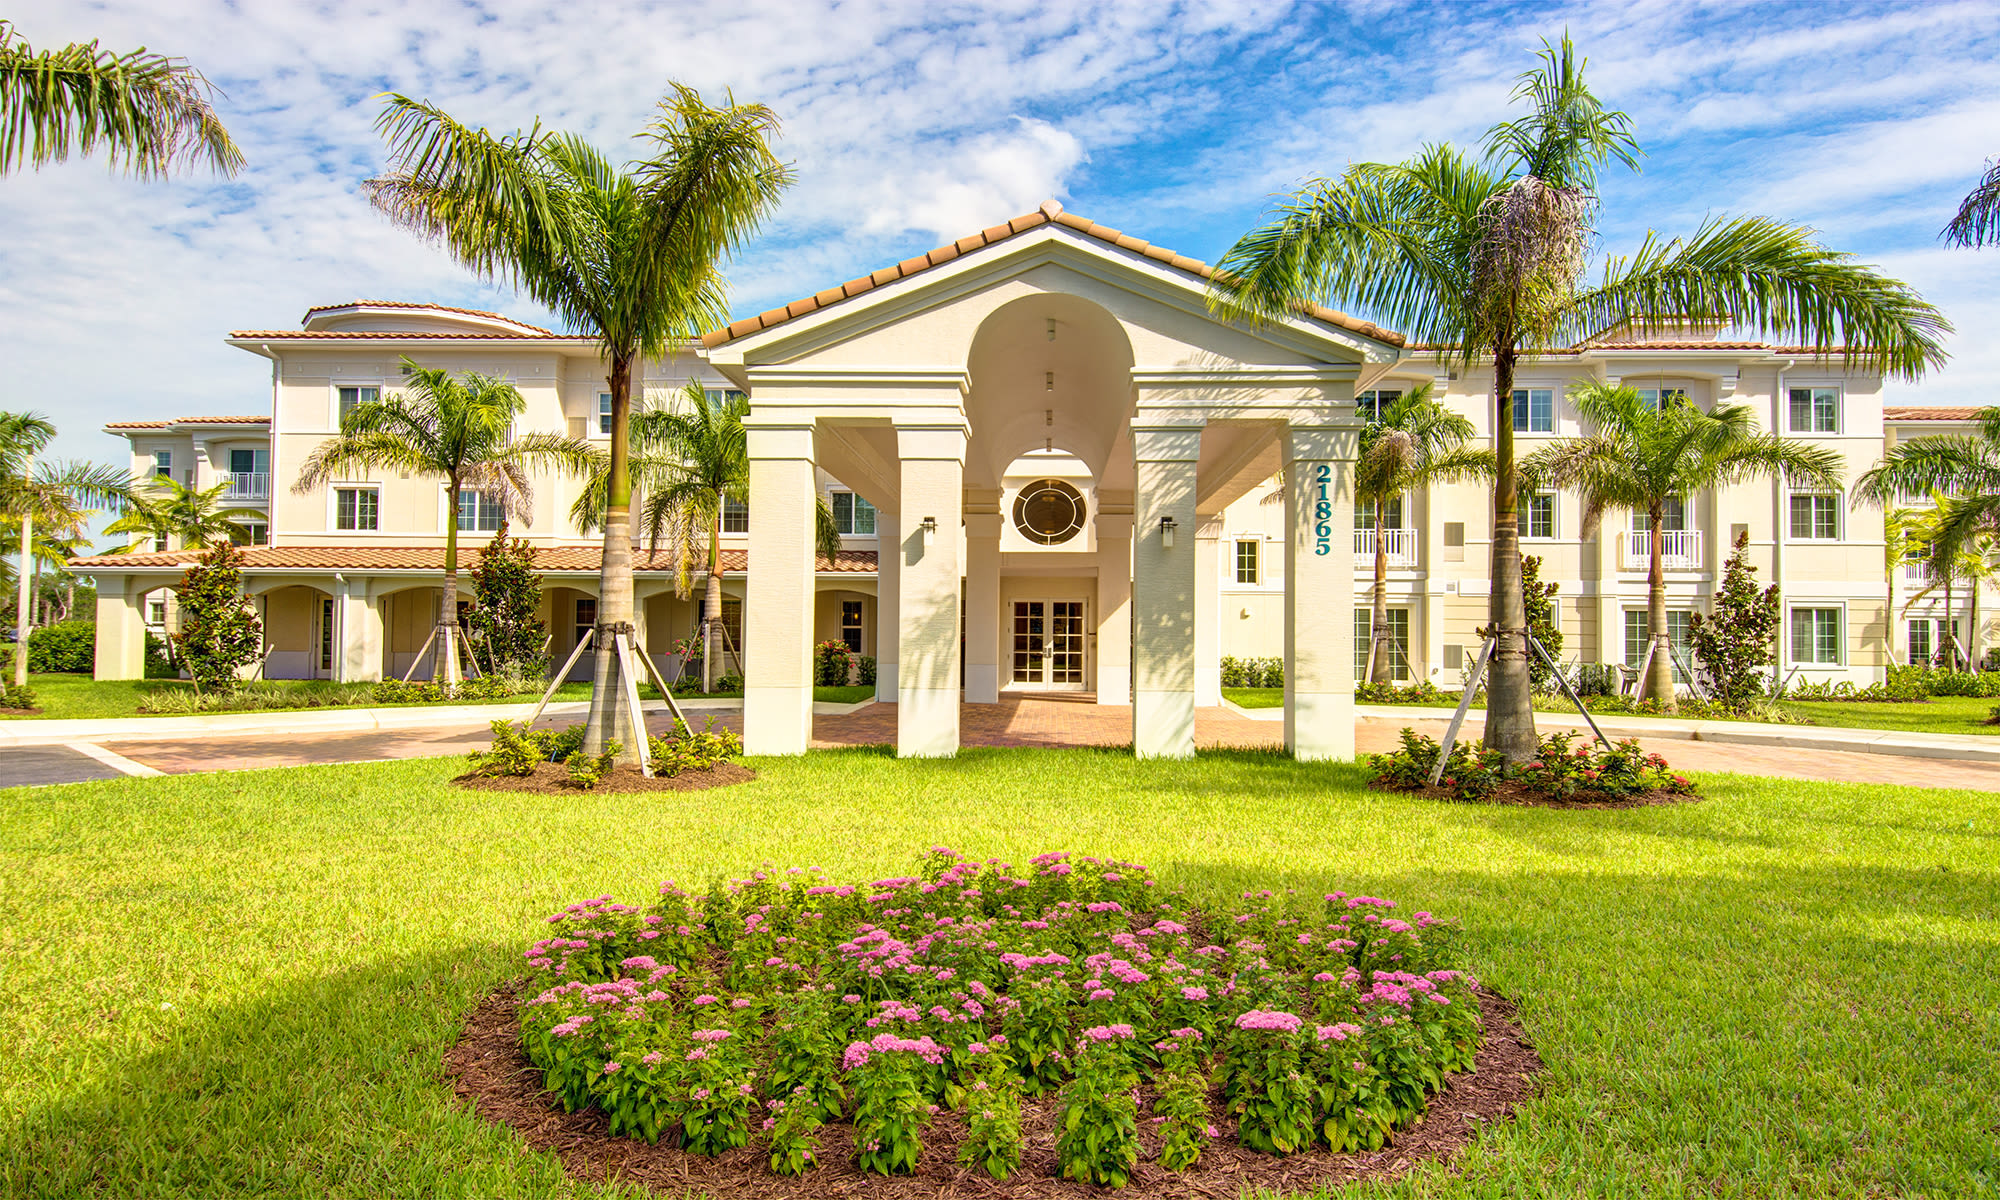 Senior living at The Meridian at Boca Raton in Boca Raton, Florida.